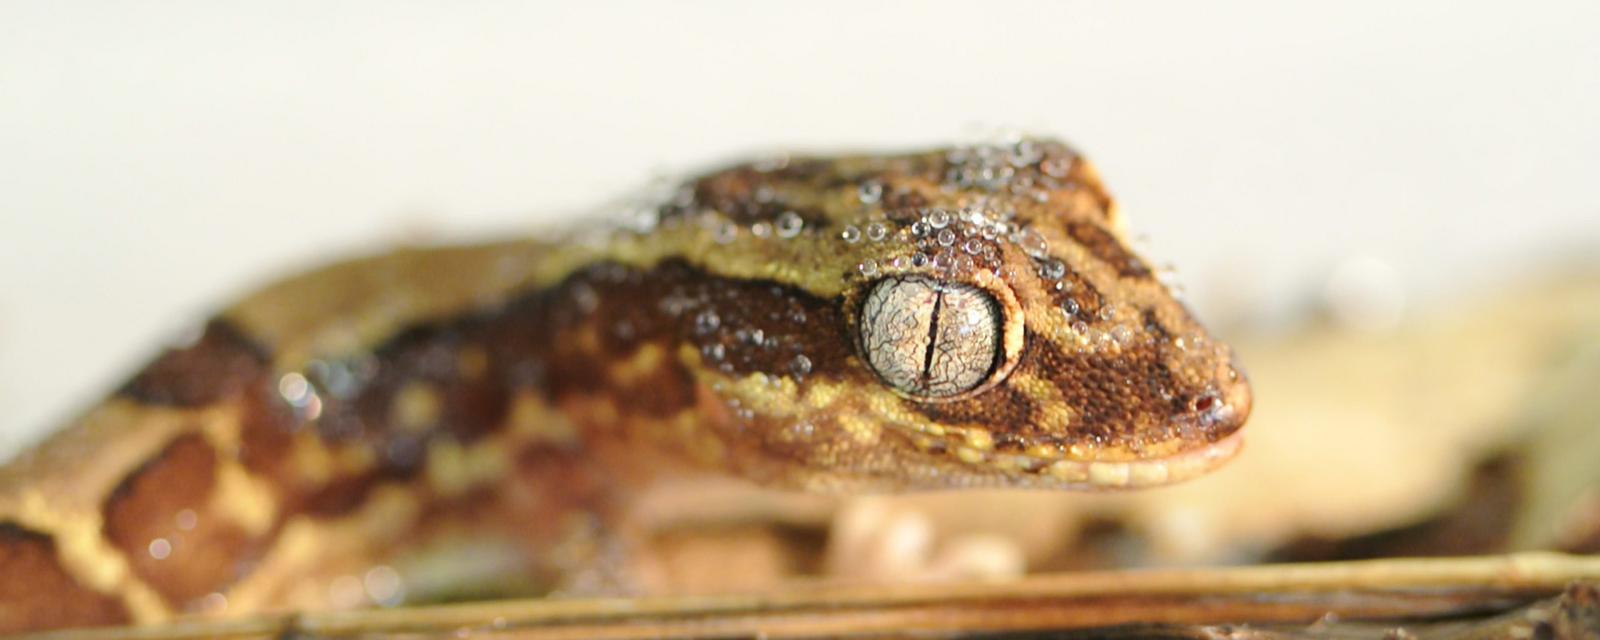 A gecko with astonishing skin (Credit: Jolanta and Gregory Watson)